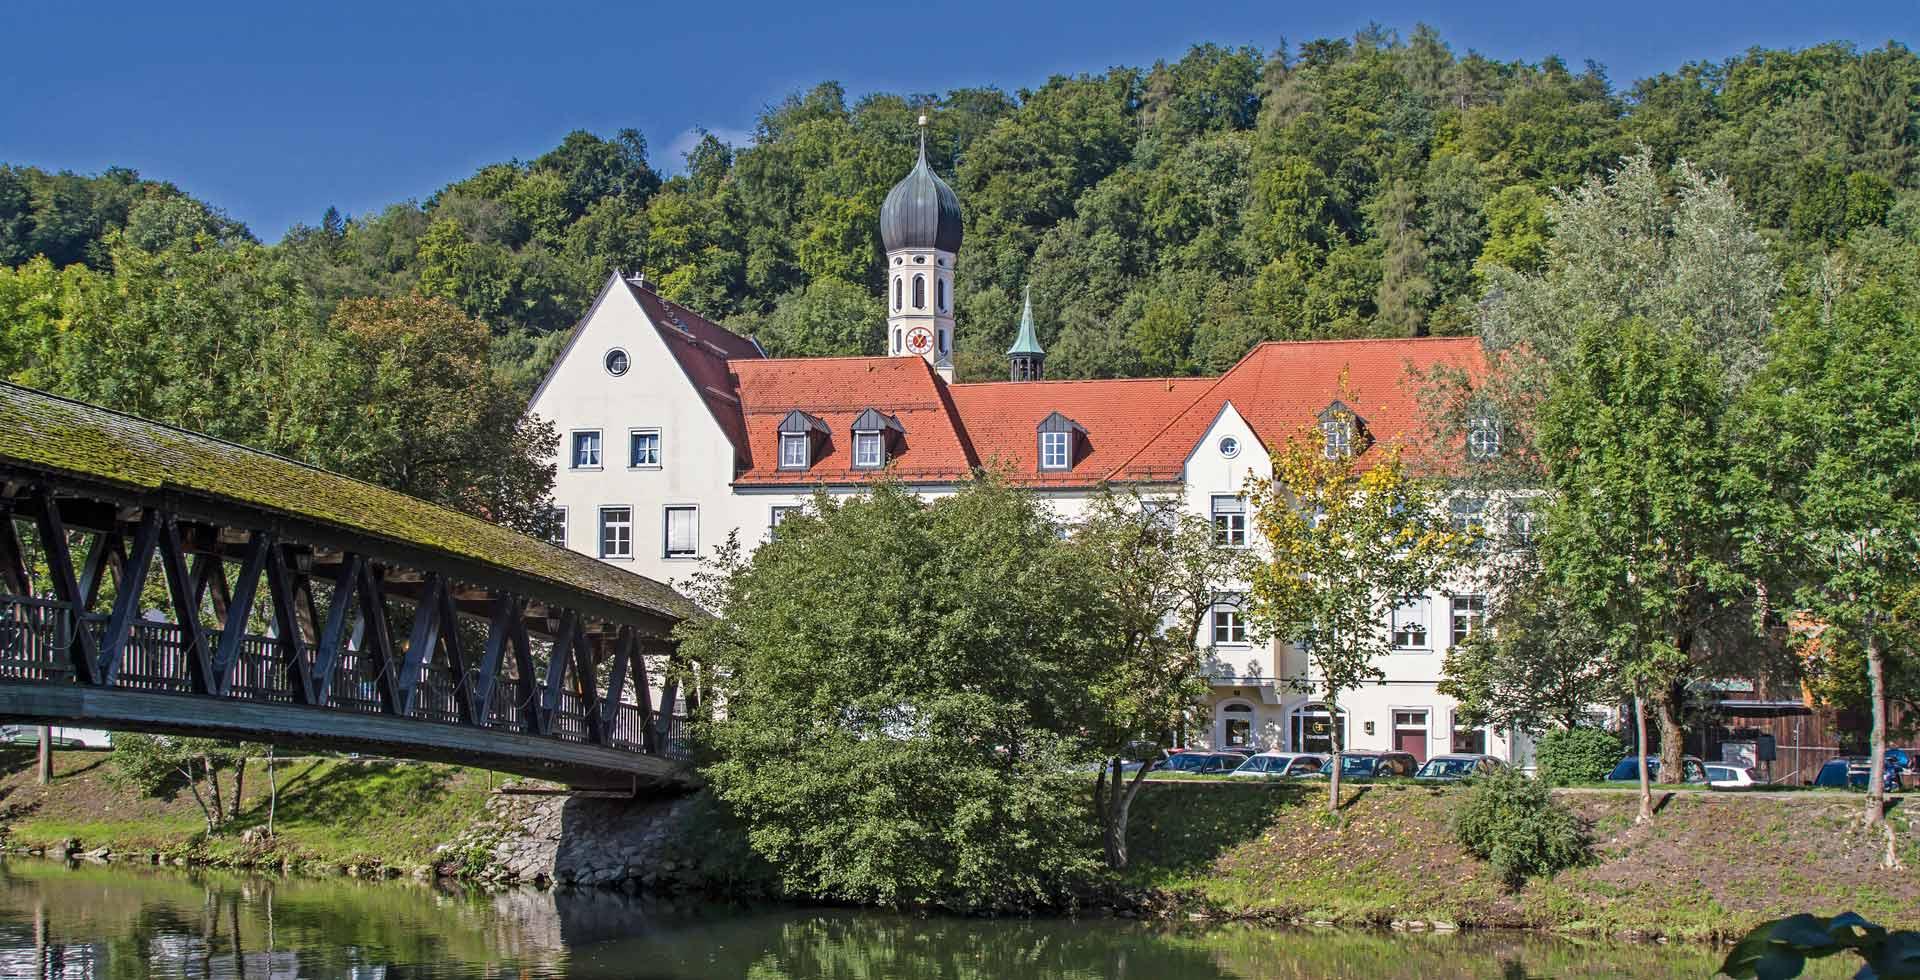 LHOMES_Neubauimmobilie_Tulpenweg-Wolfratshausen-Lage